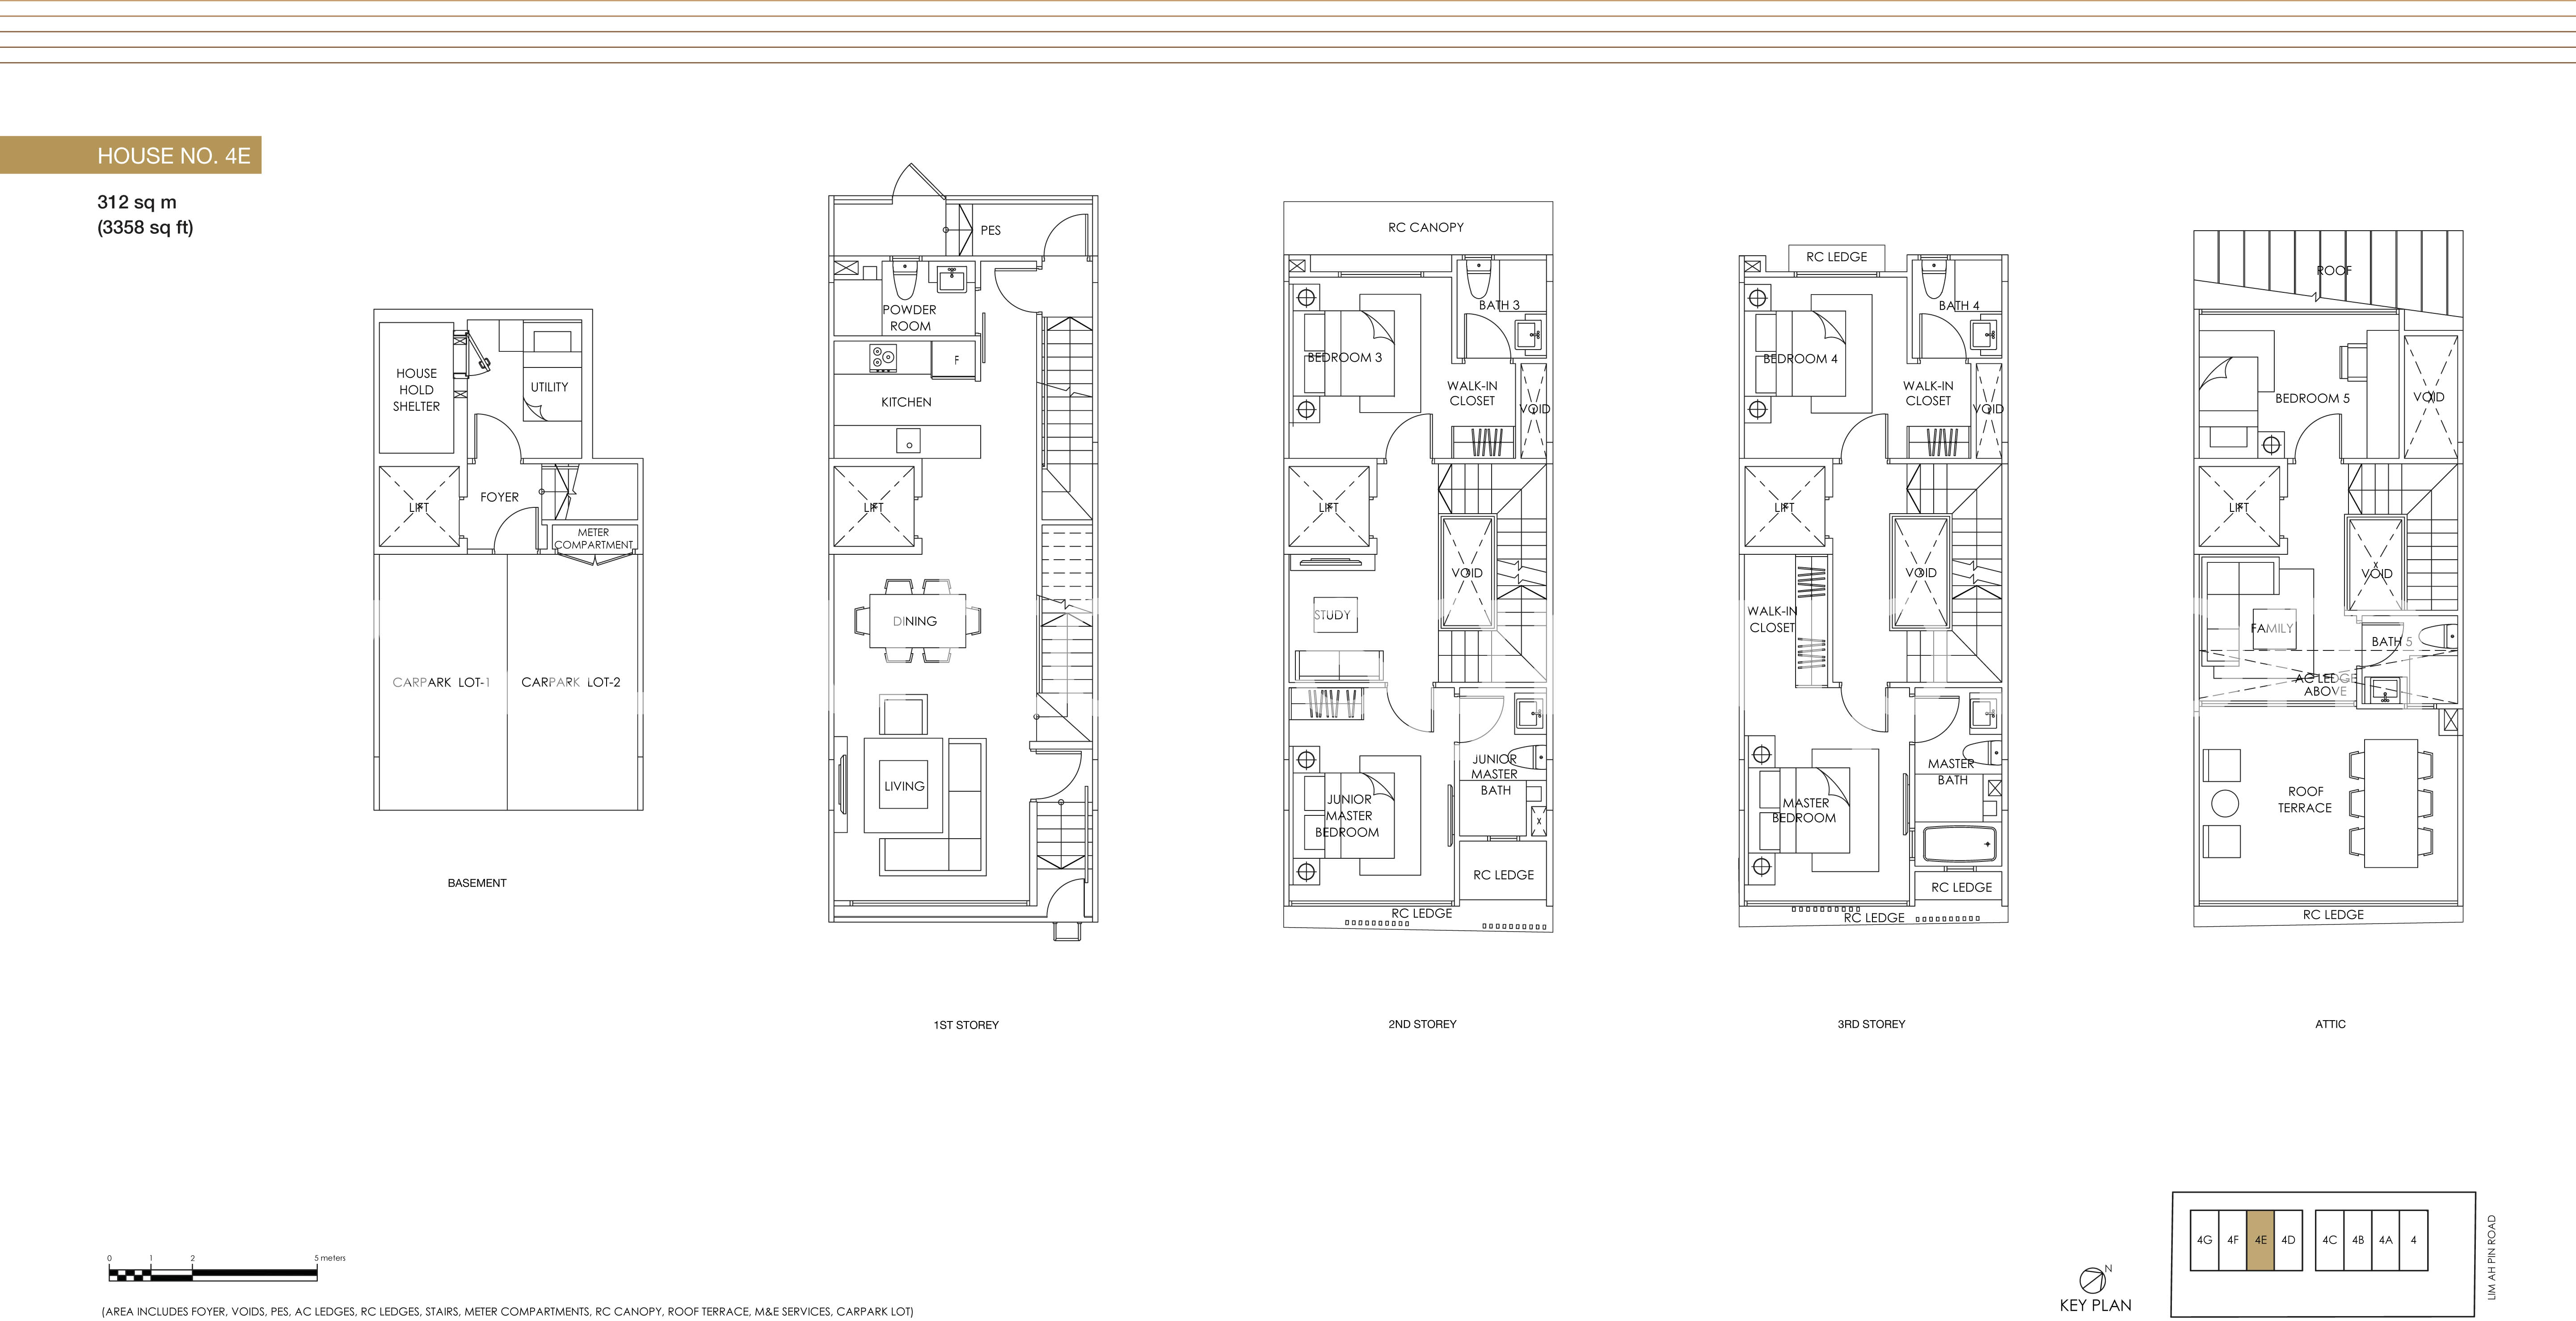 House no. 4E